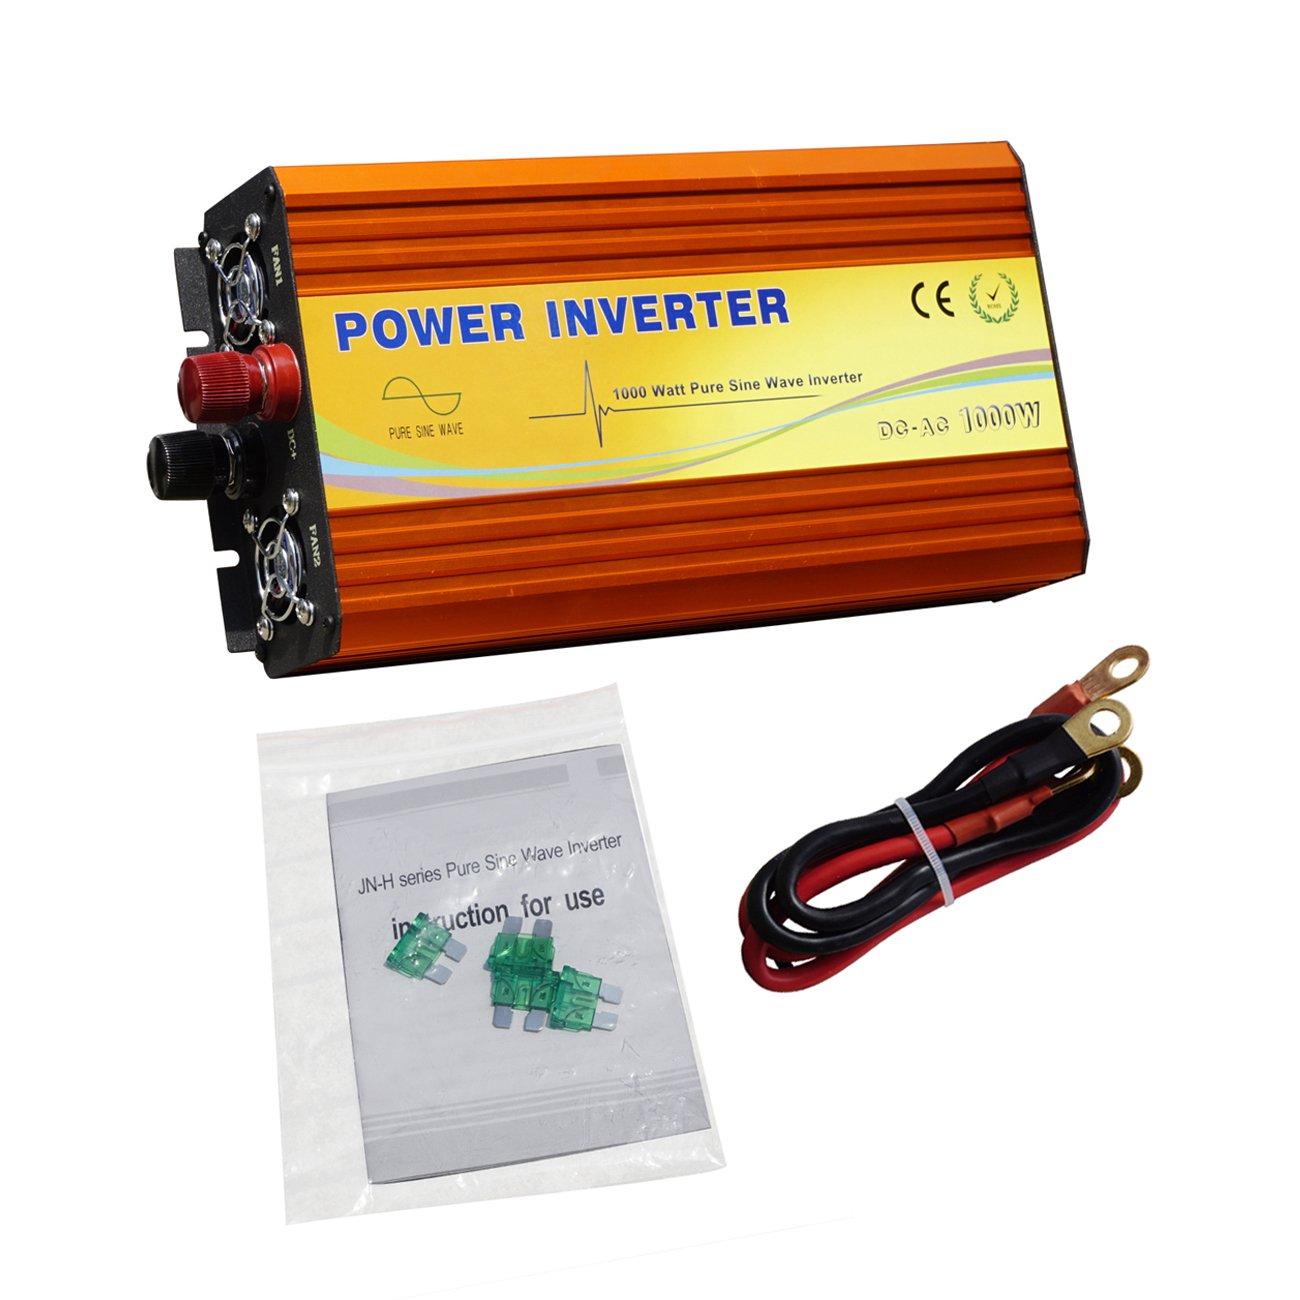 ECO-WORTHY 1000W 24V Pure Sine Inverter 110V DC Off Grid Inverter W MPPT Function 1000W 24V Input